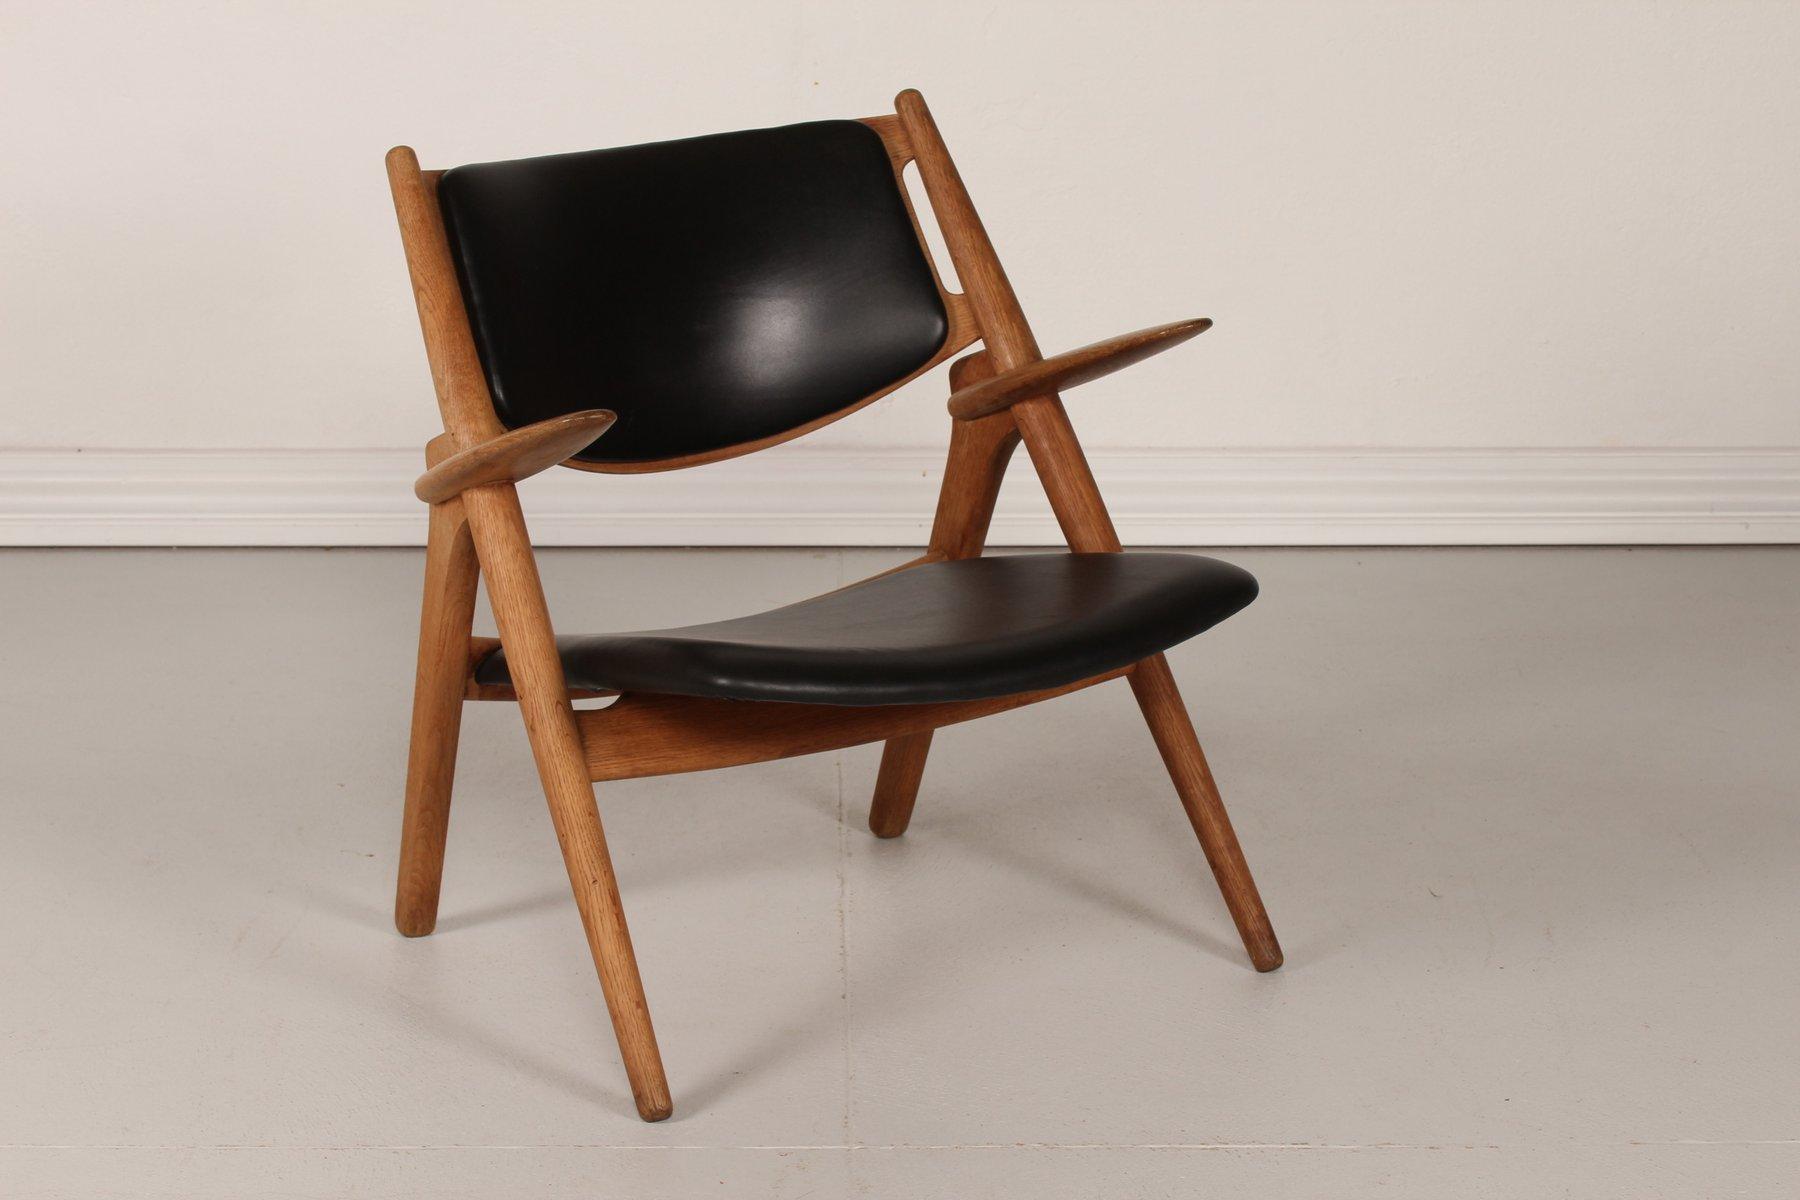 ch 28 eiche sawbench stuhl von hans j wegner f r carl. Black Bedroom Furniture Sets. Home Design Ideas